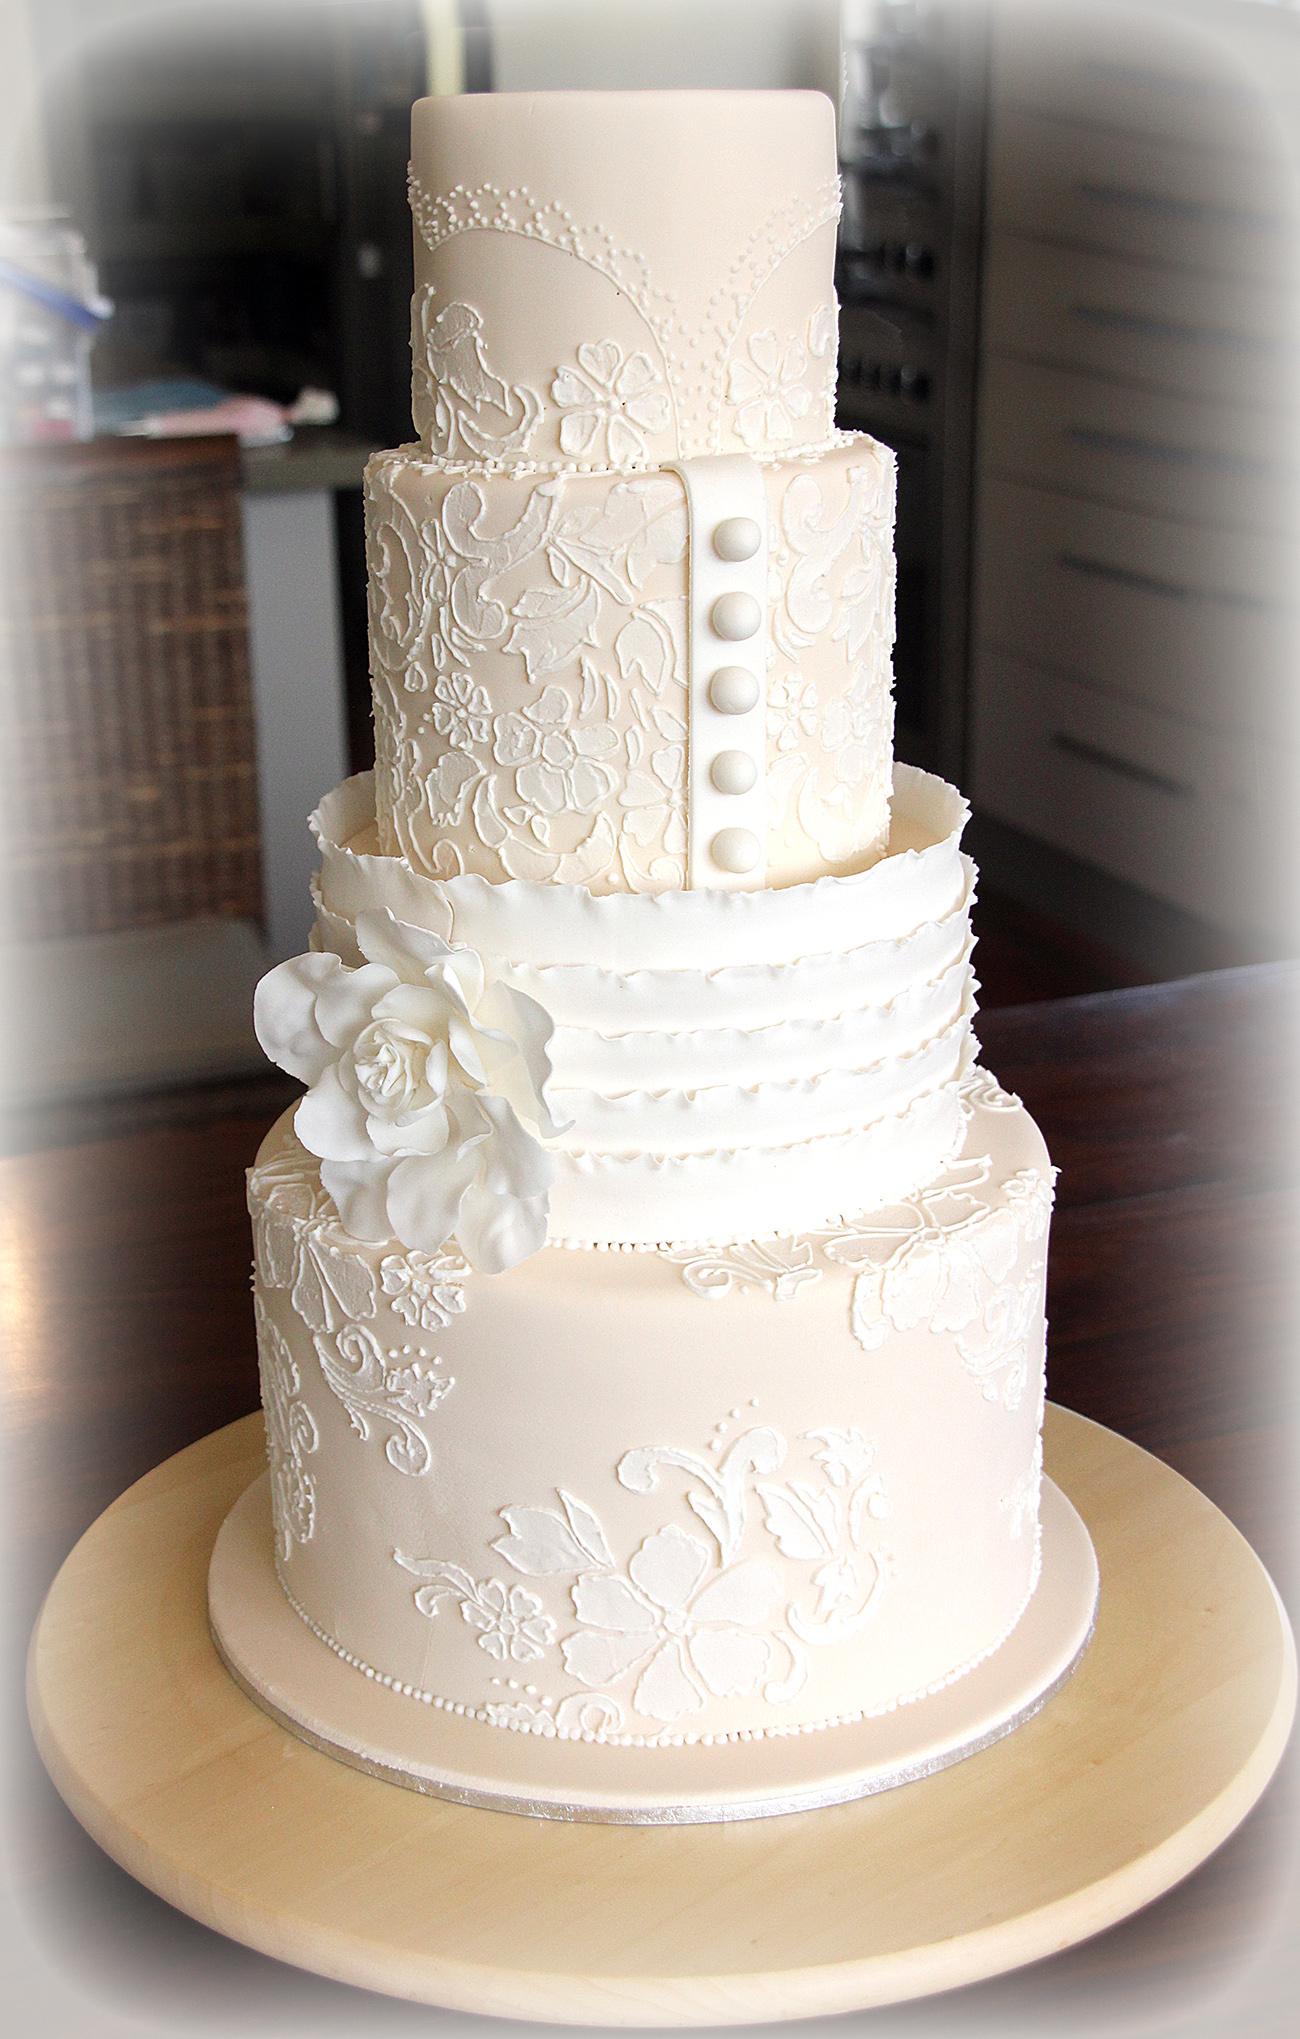 cake-1mb.jpg